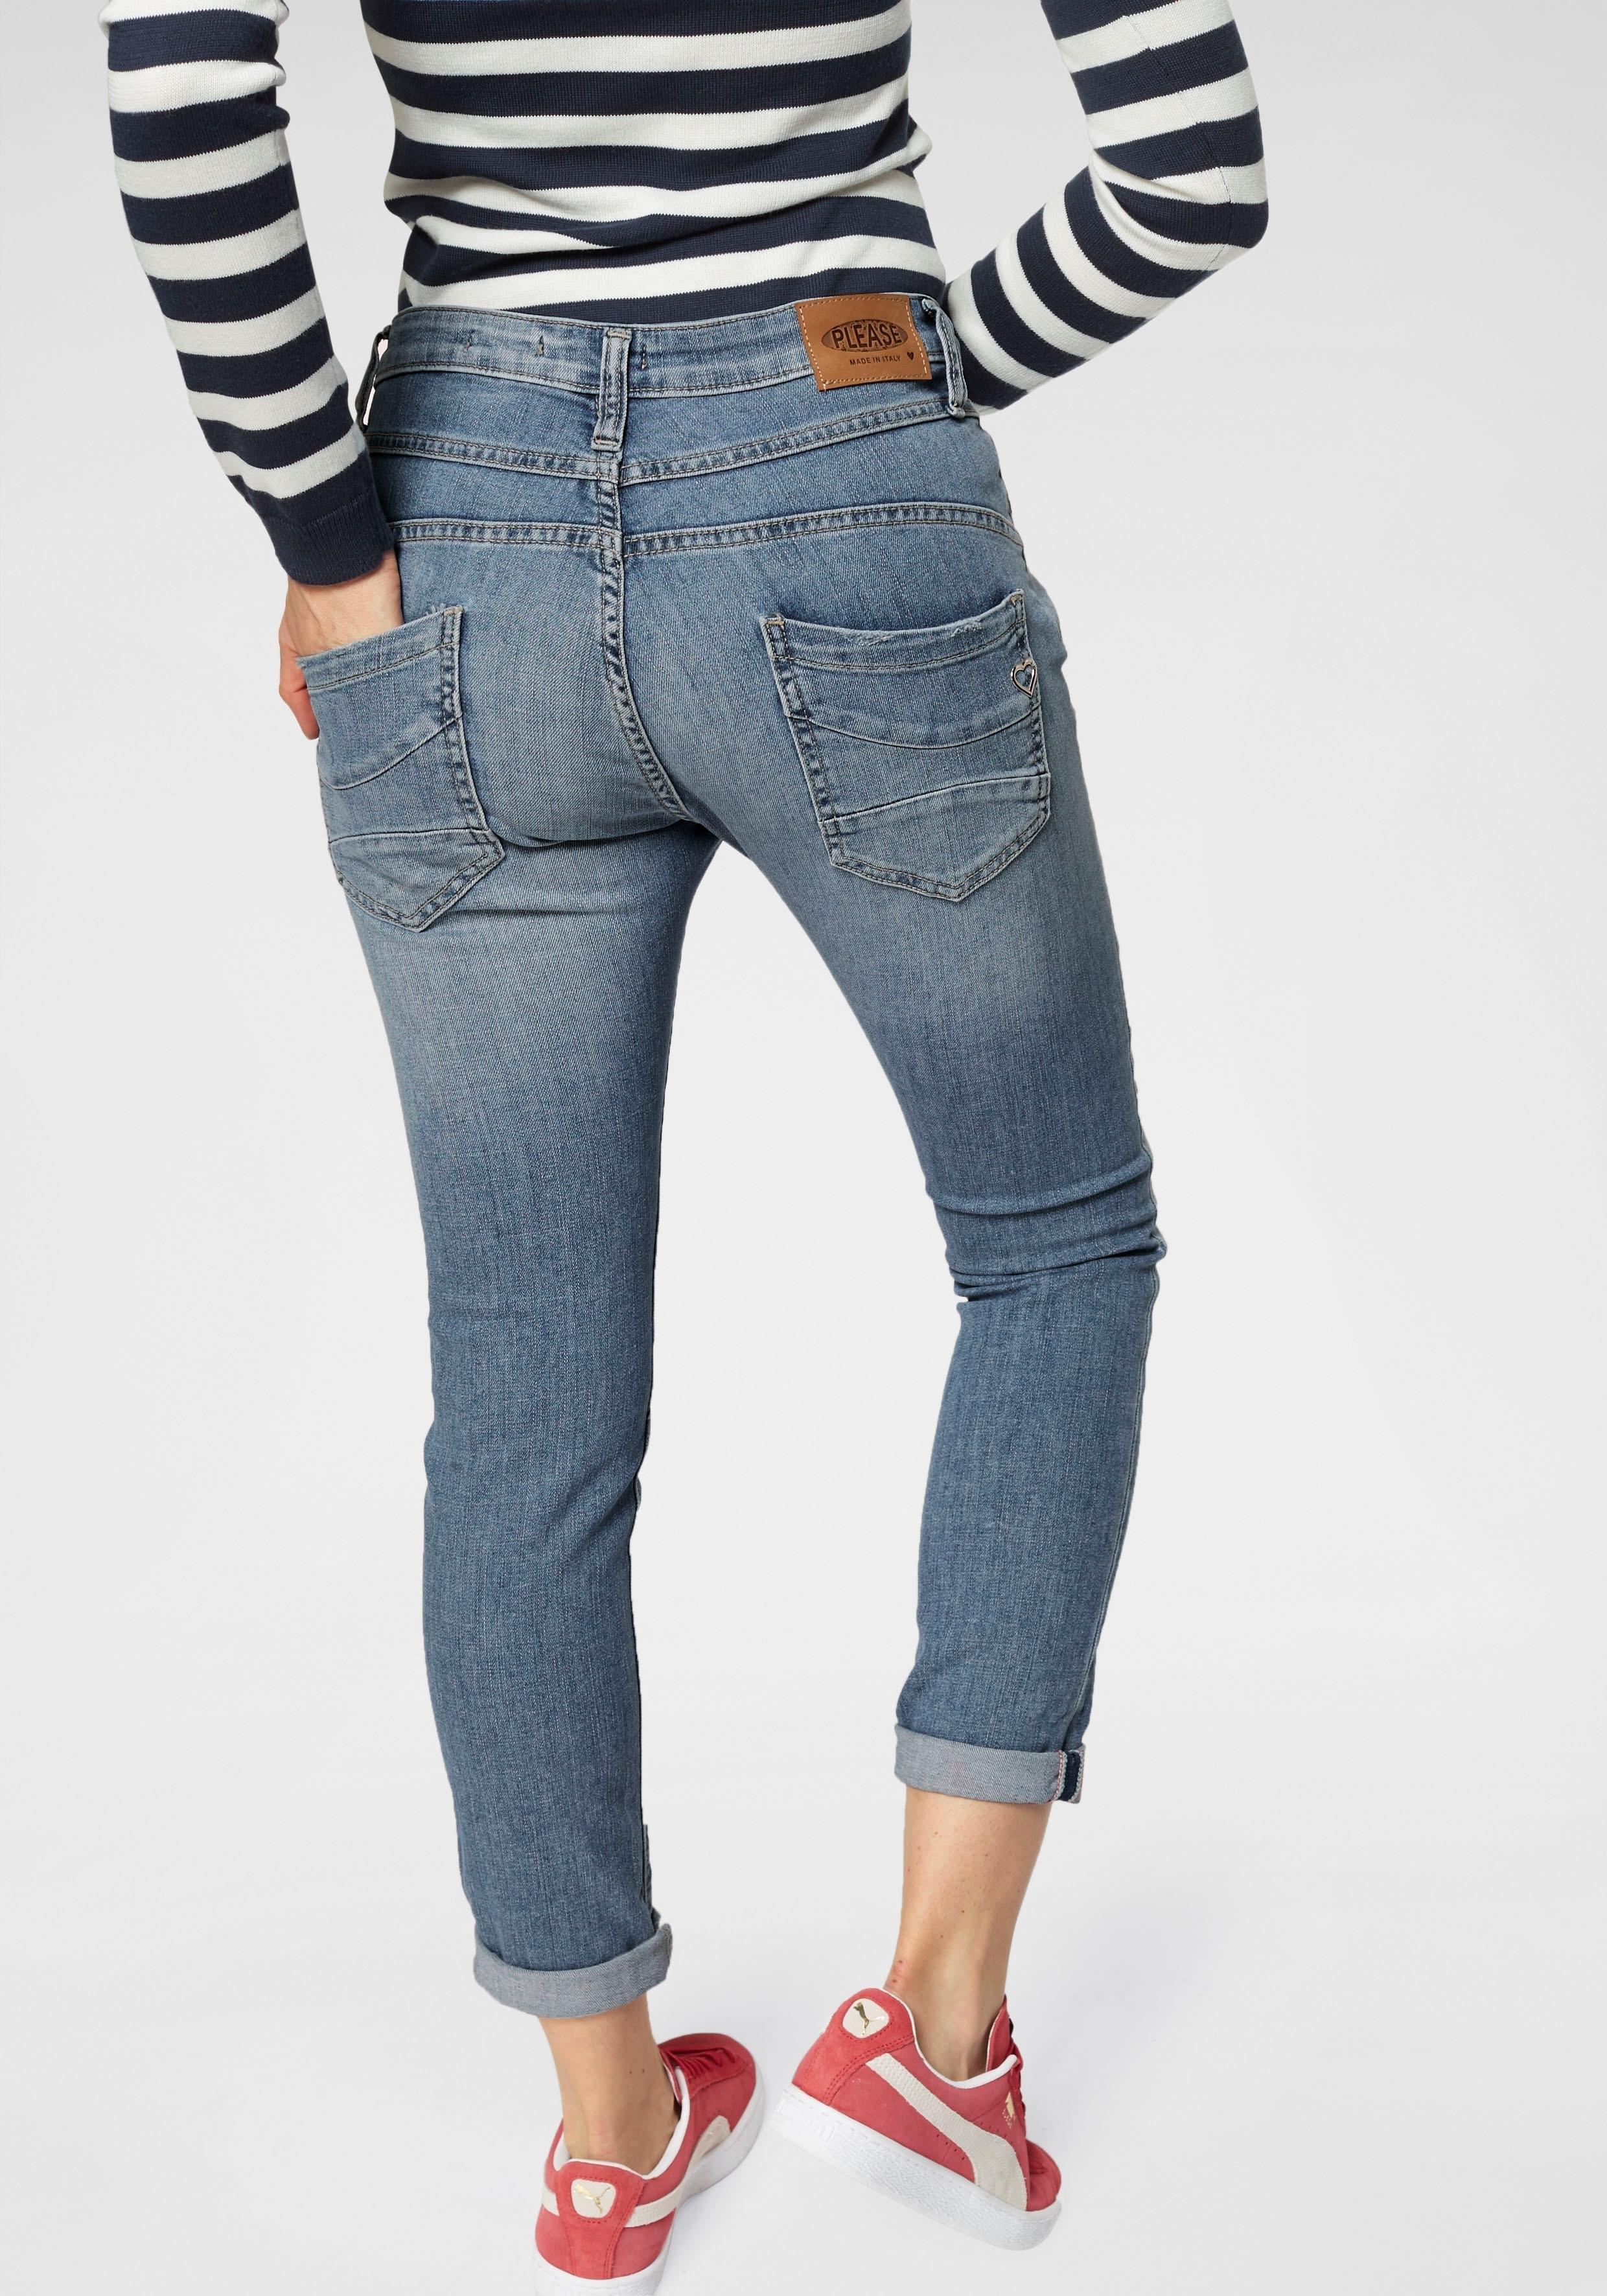 Please Jeans 5-pocketsjeans P78A casual boyfriend jeans in lichte krinkel-look, met omslag aan de pijpen nu online kopen bij OTTO